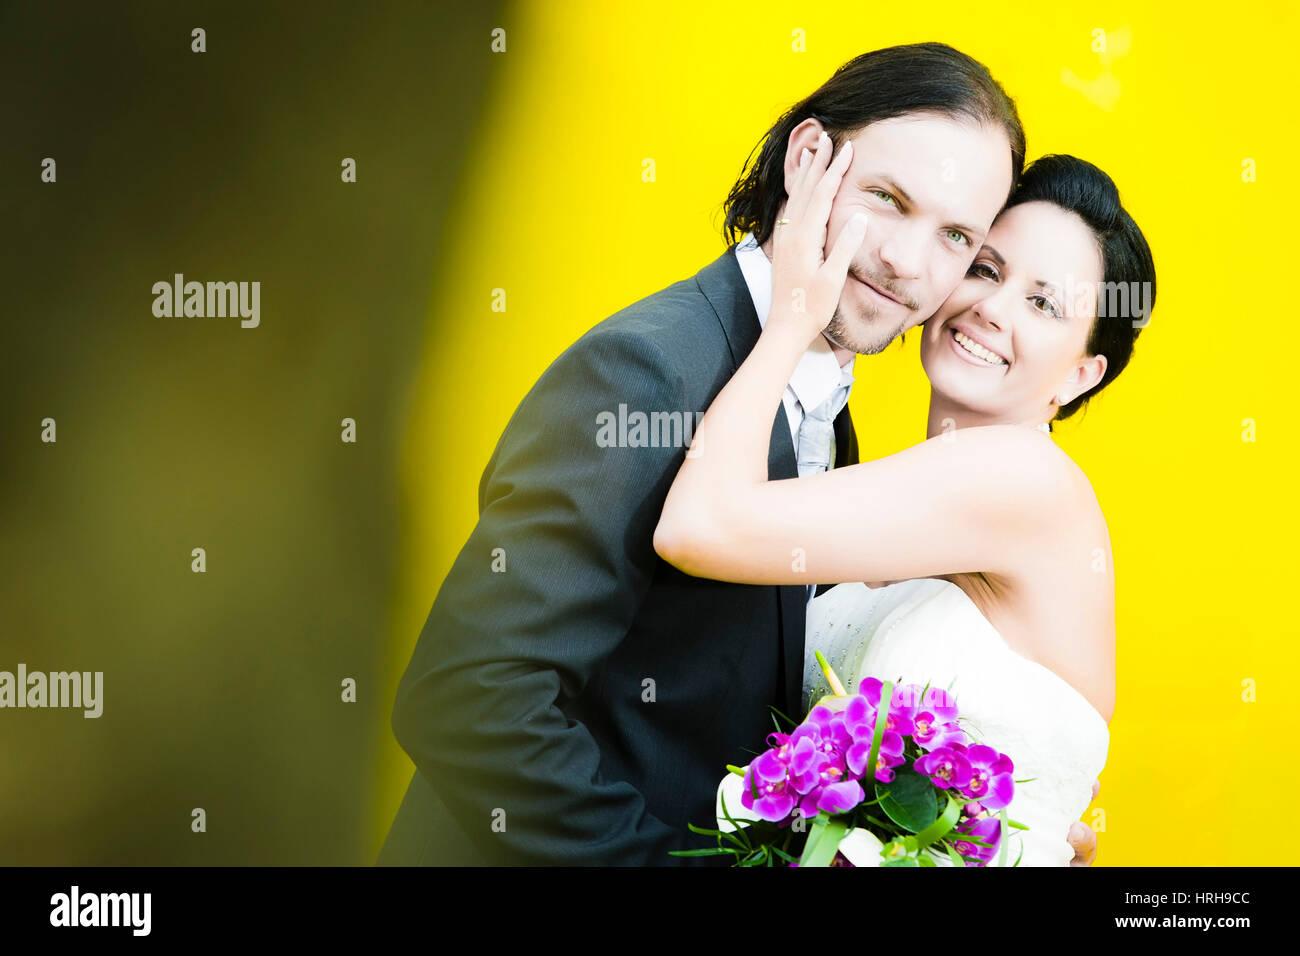 Model released, Brautpaar - bridal couple Stock Photo